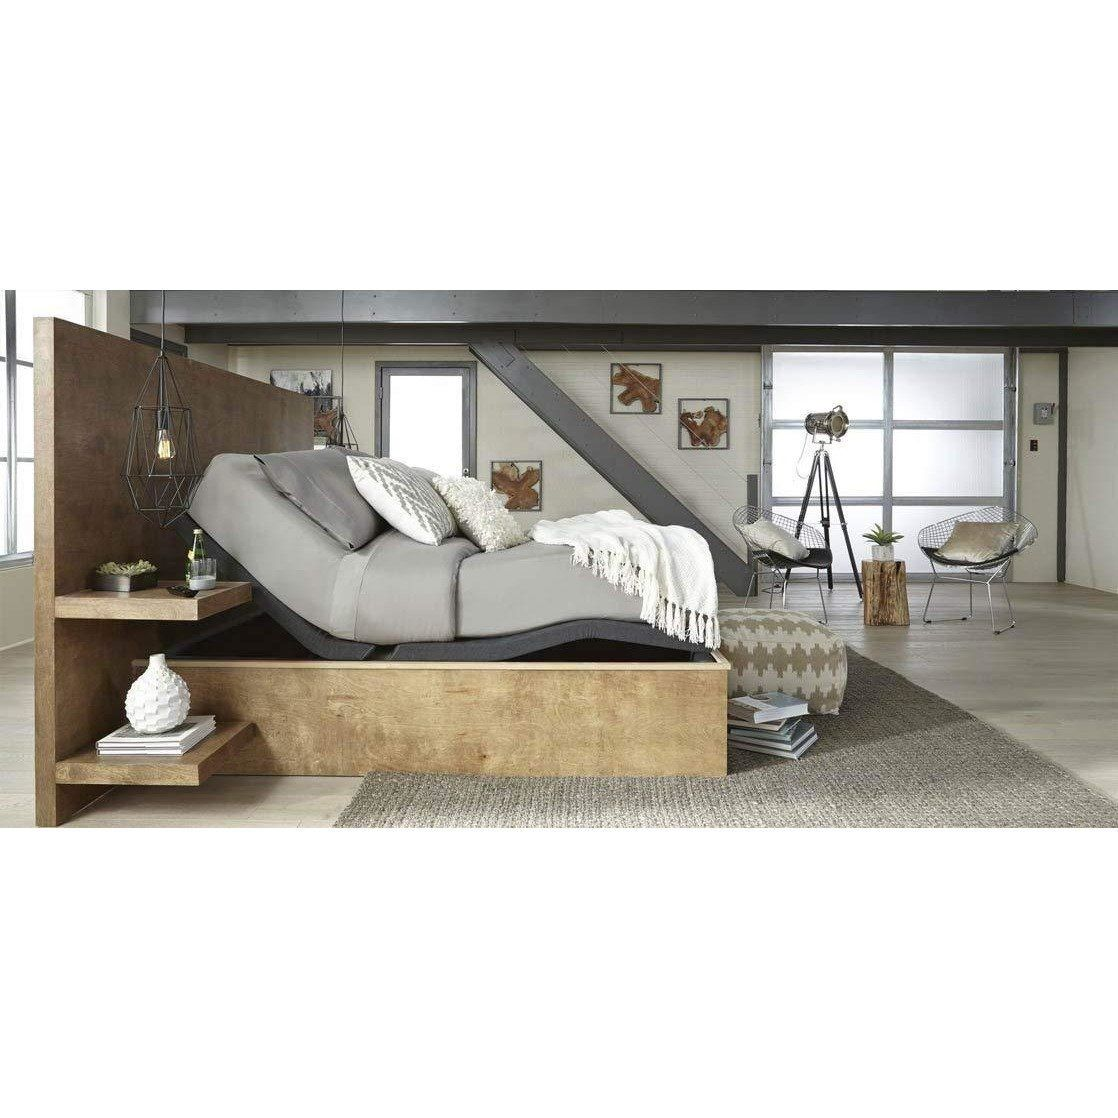 Ergomotion Contour Pure Silver Adjustable Bed Adjustable